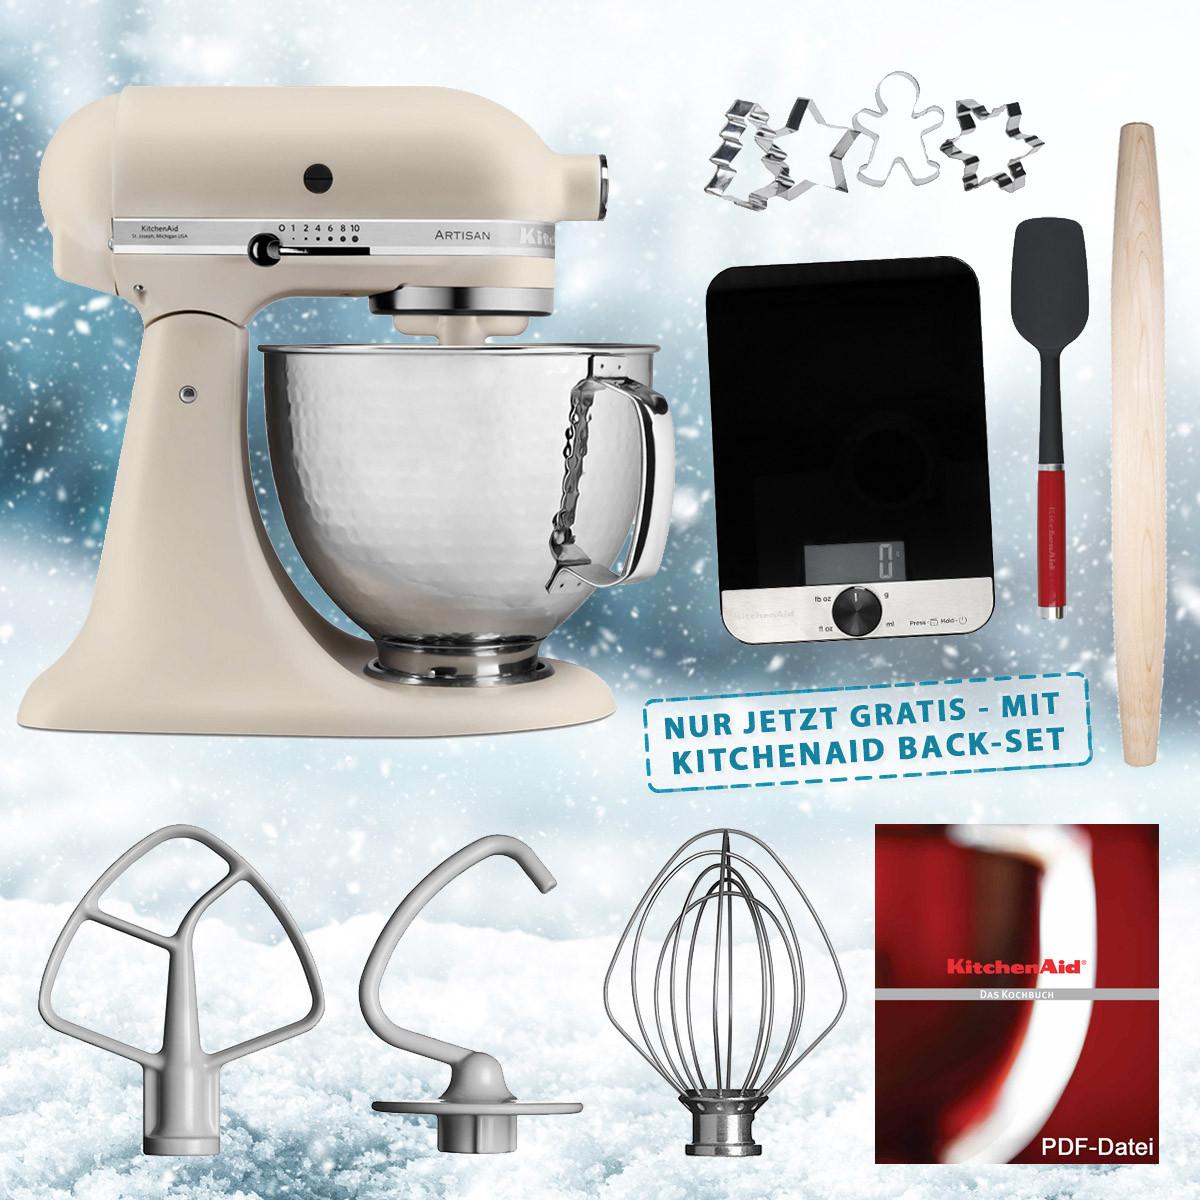 KitchenAid Artisan Küchenmaschine Leinen matt 5KSM156HMEFL 4,8-L